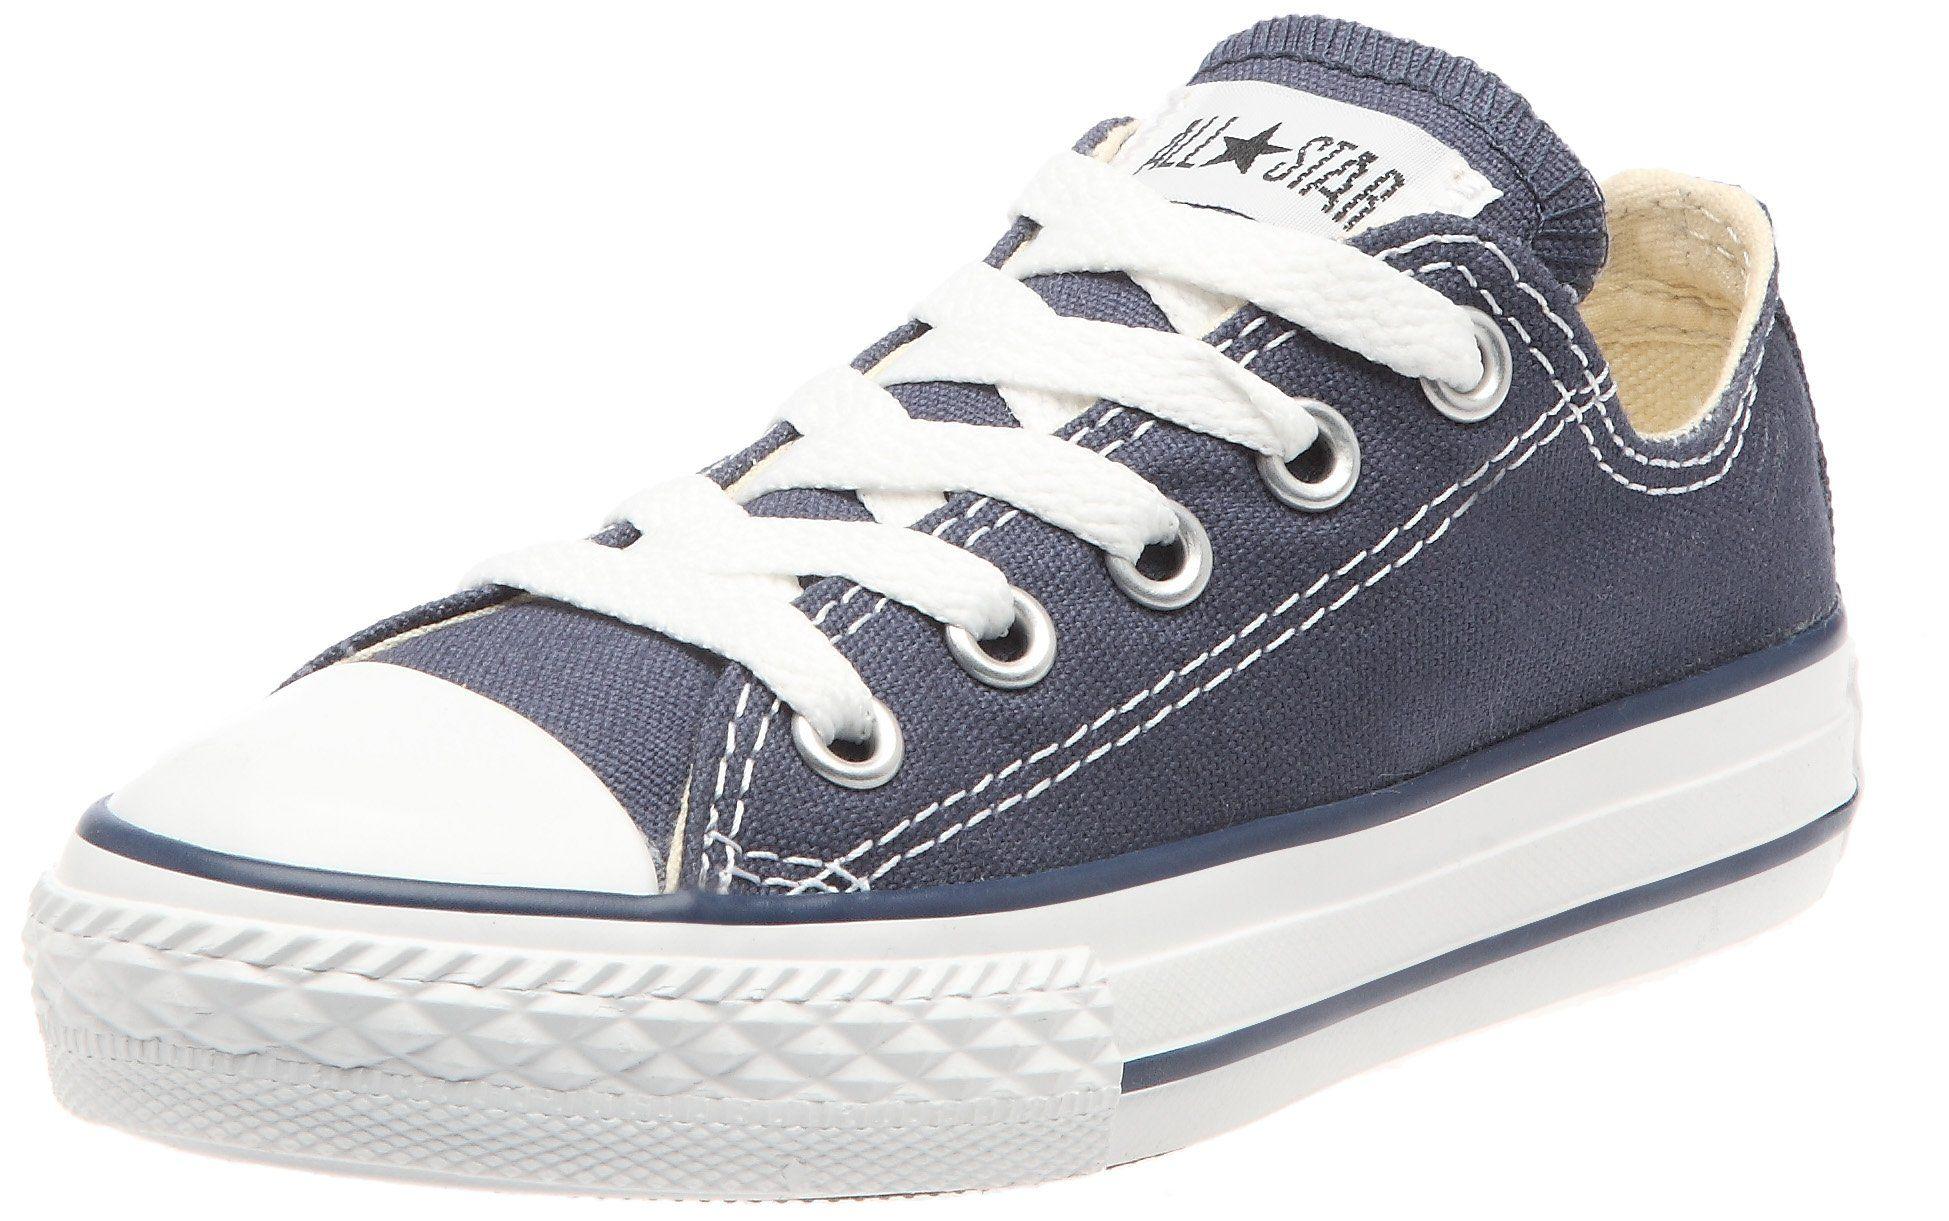 5485a9f39115b Amazon.com  Converse Girls  Chuck Taylor All Star Seasonal Low Cut Sneaker   Clothing SIZE 8